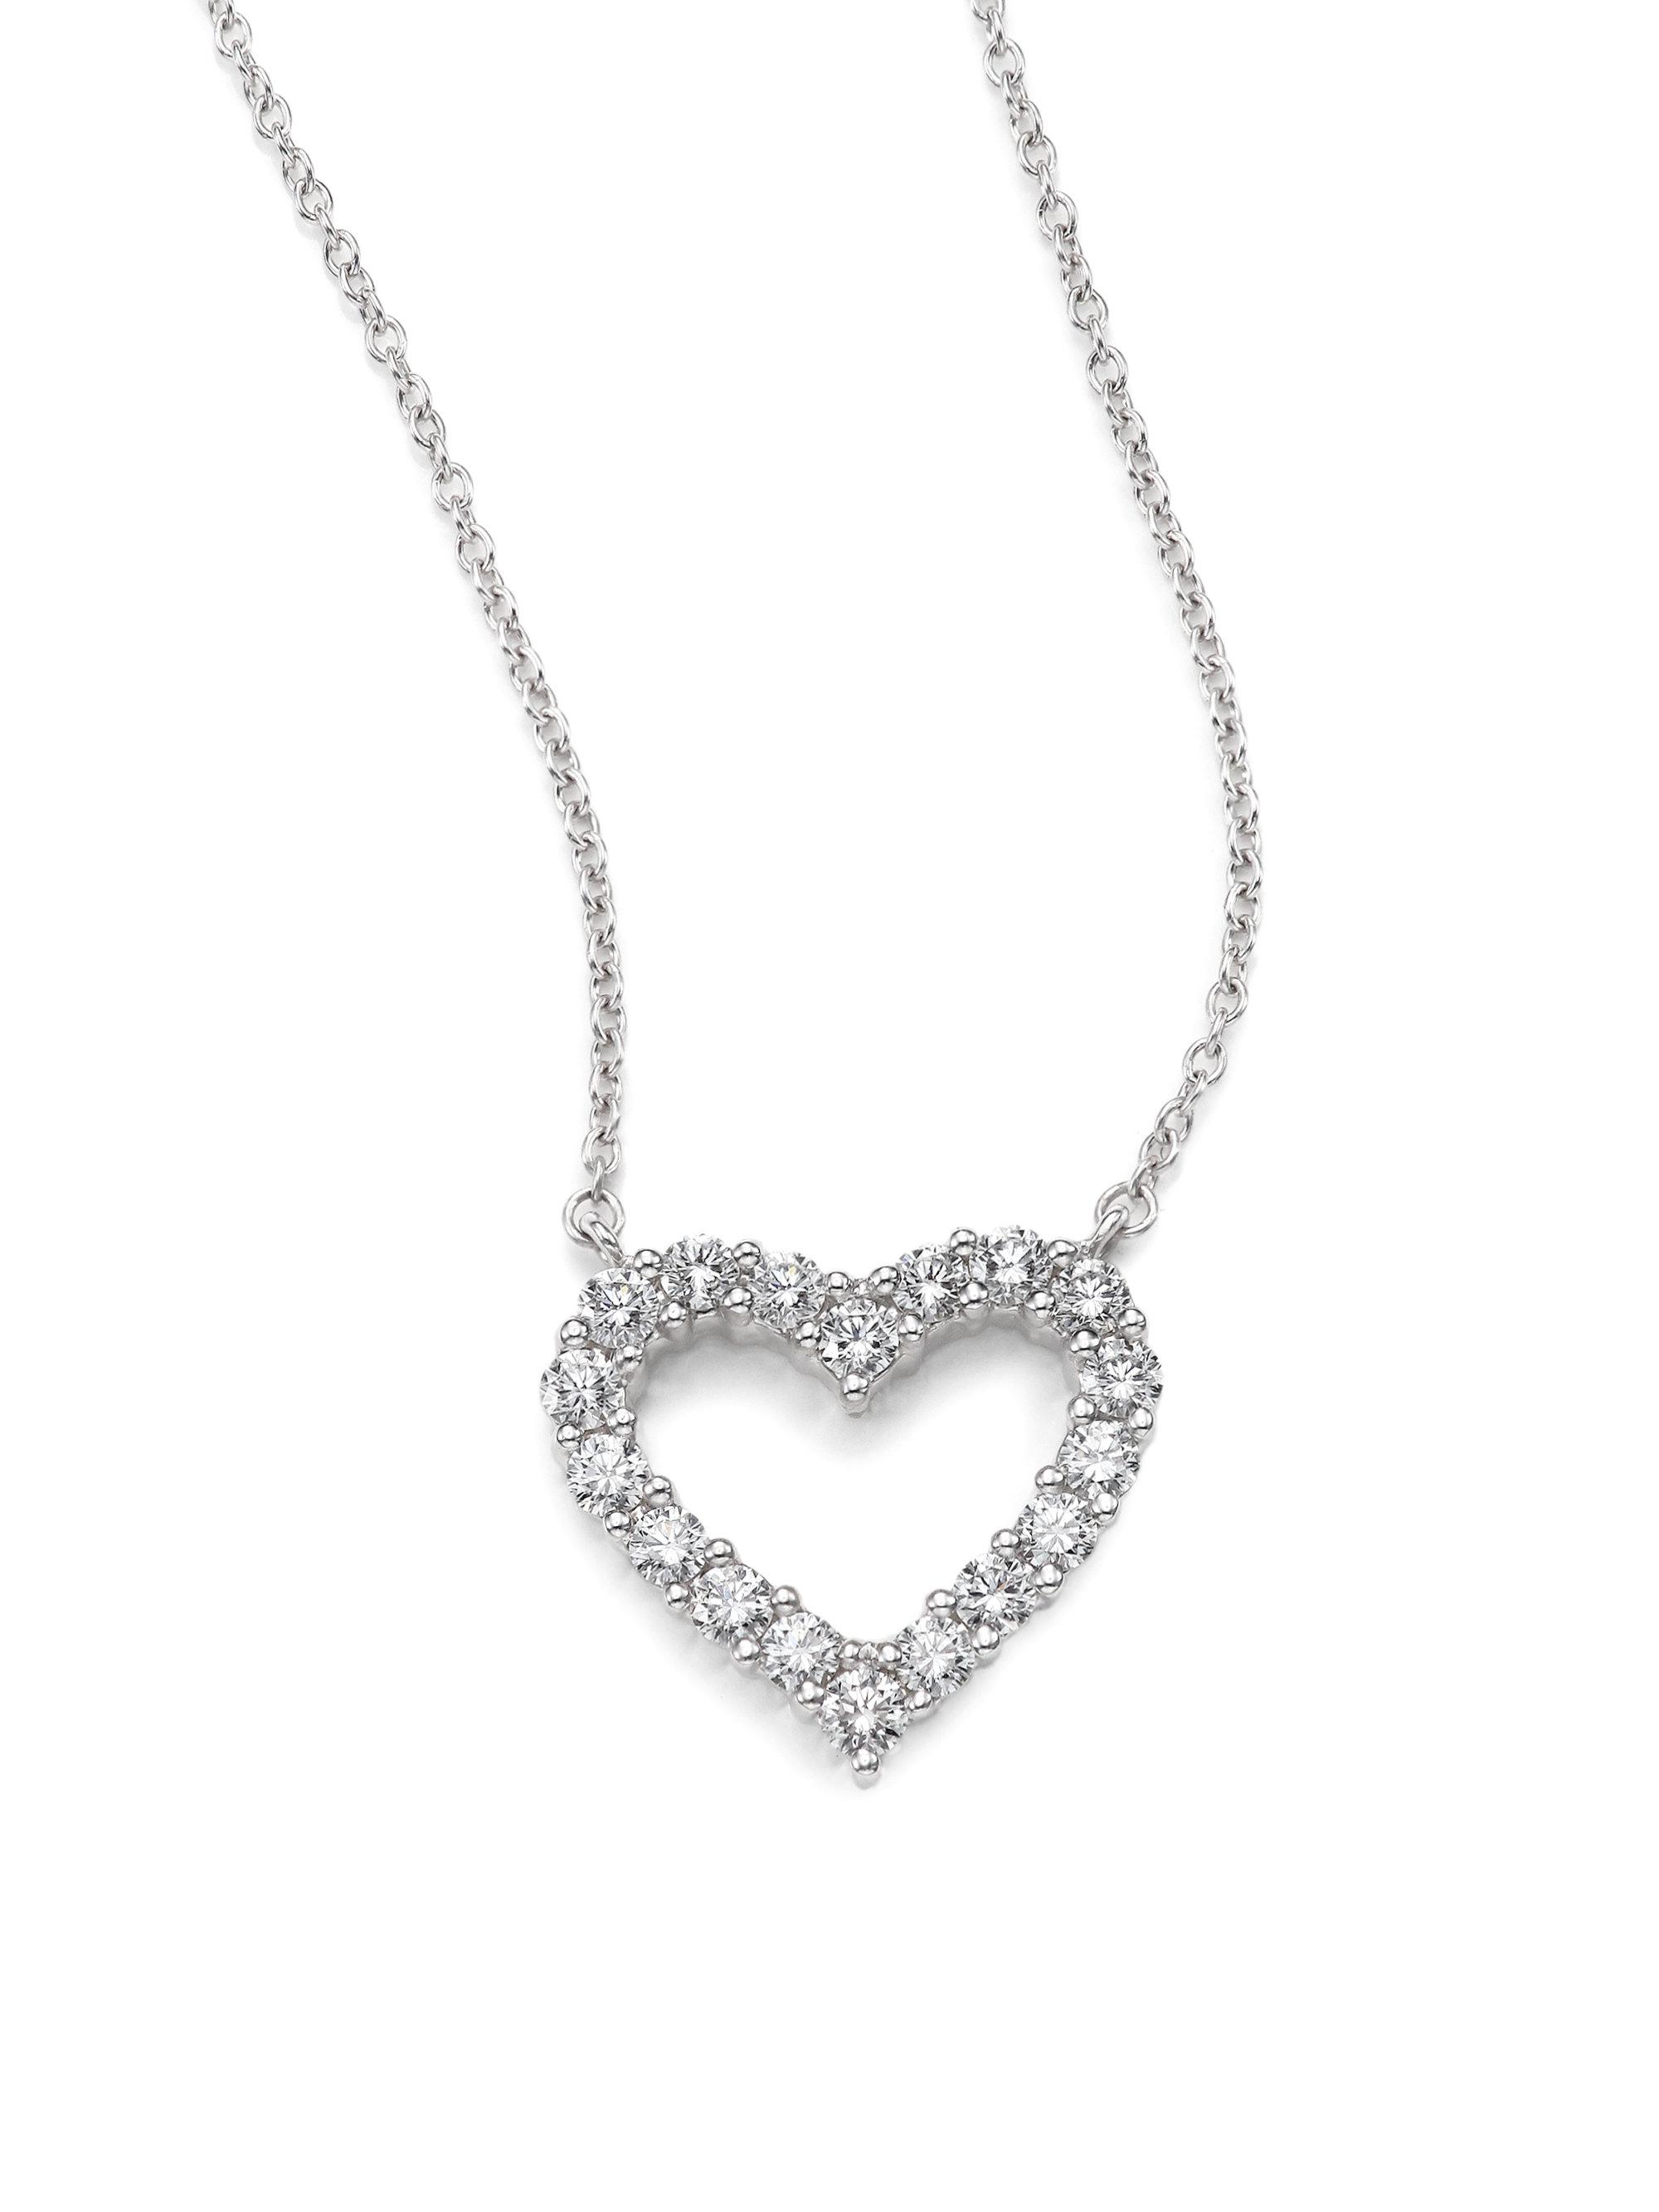 Kwiat Diamond & 18k White Gold Heart Pendant Necklace in White